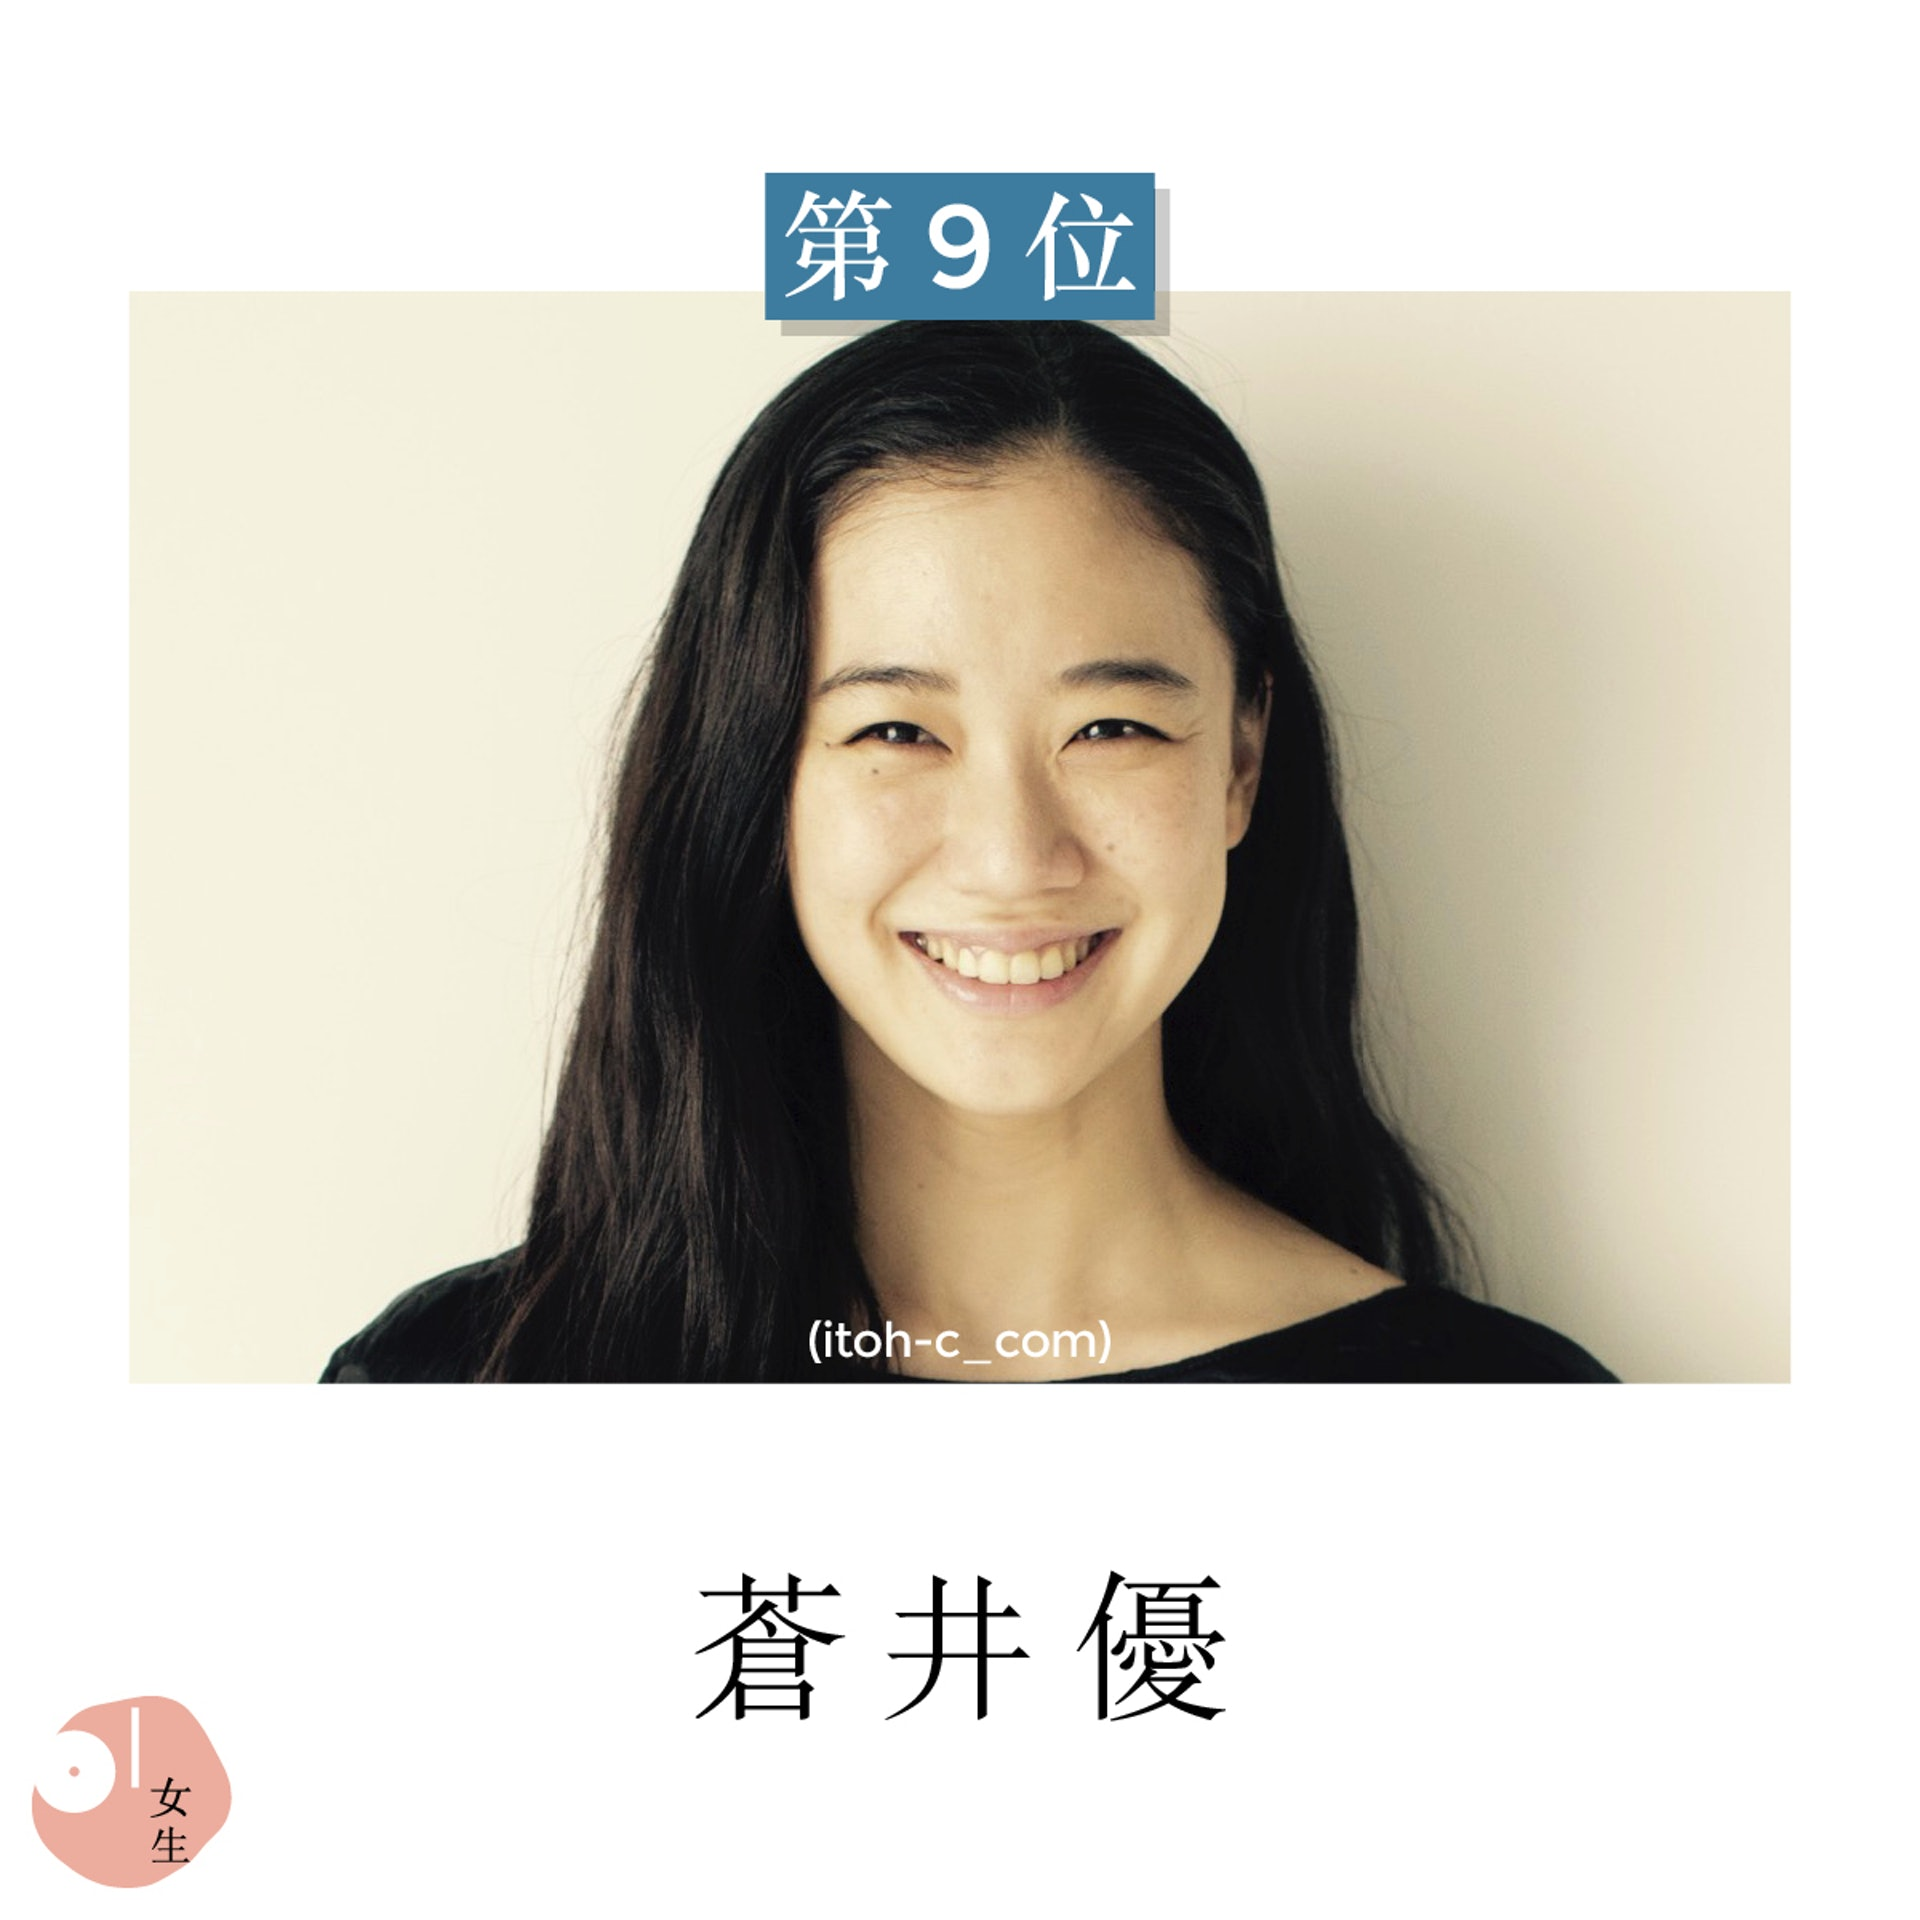 第9位:蒼井優 (itoh-c_com)